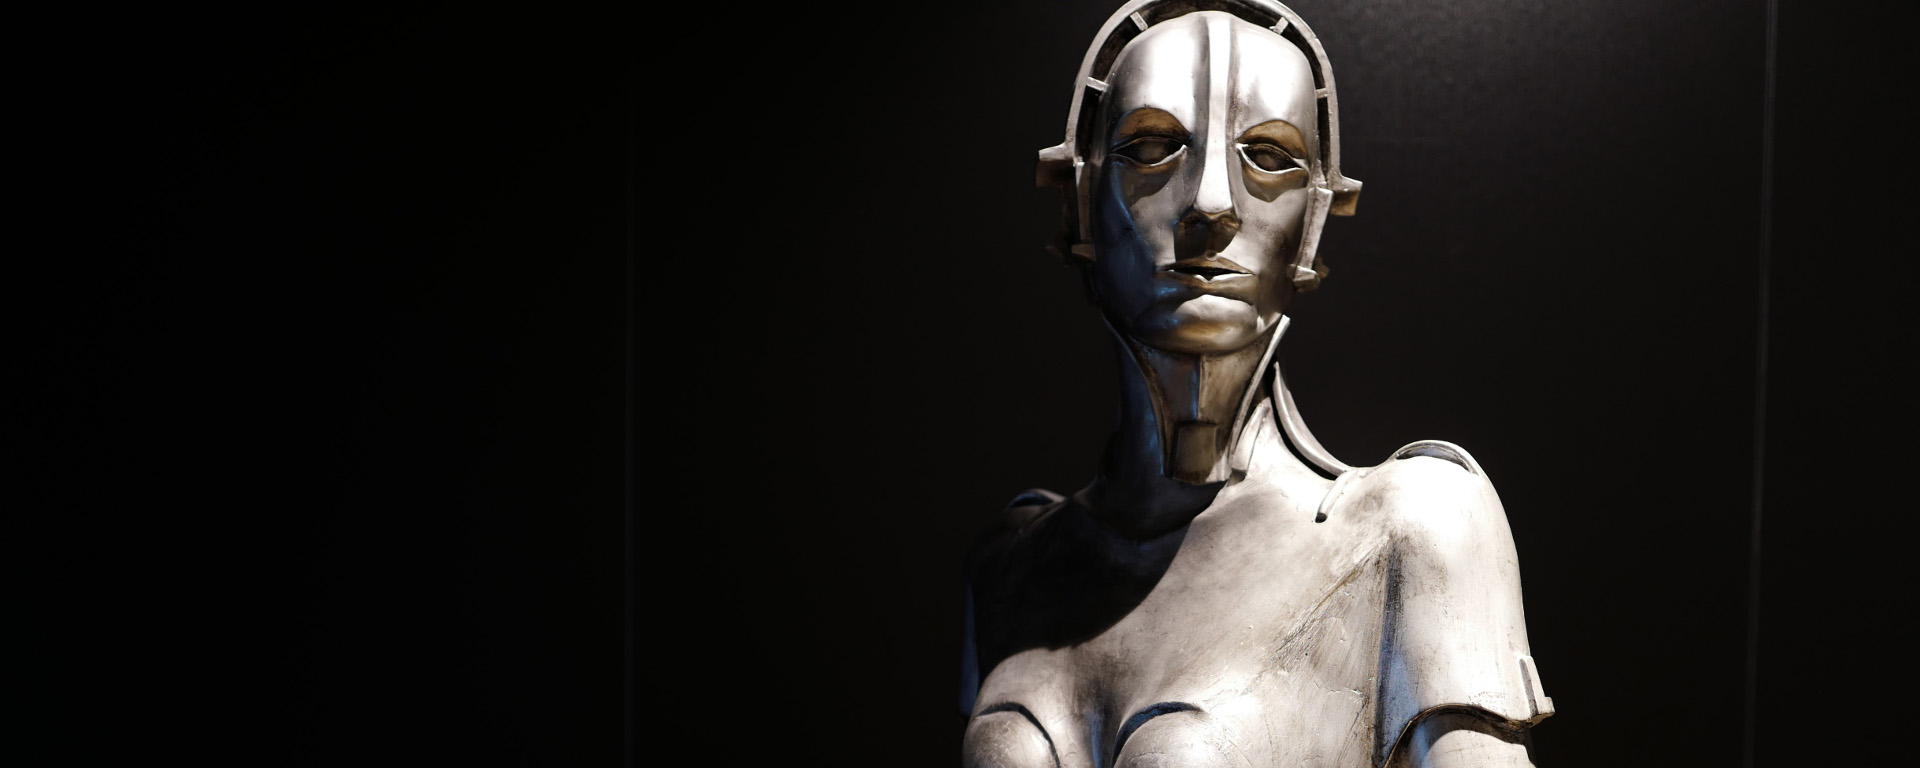 robotics . mechatronics . bionics . automation